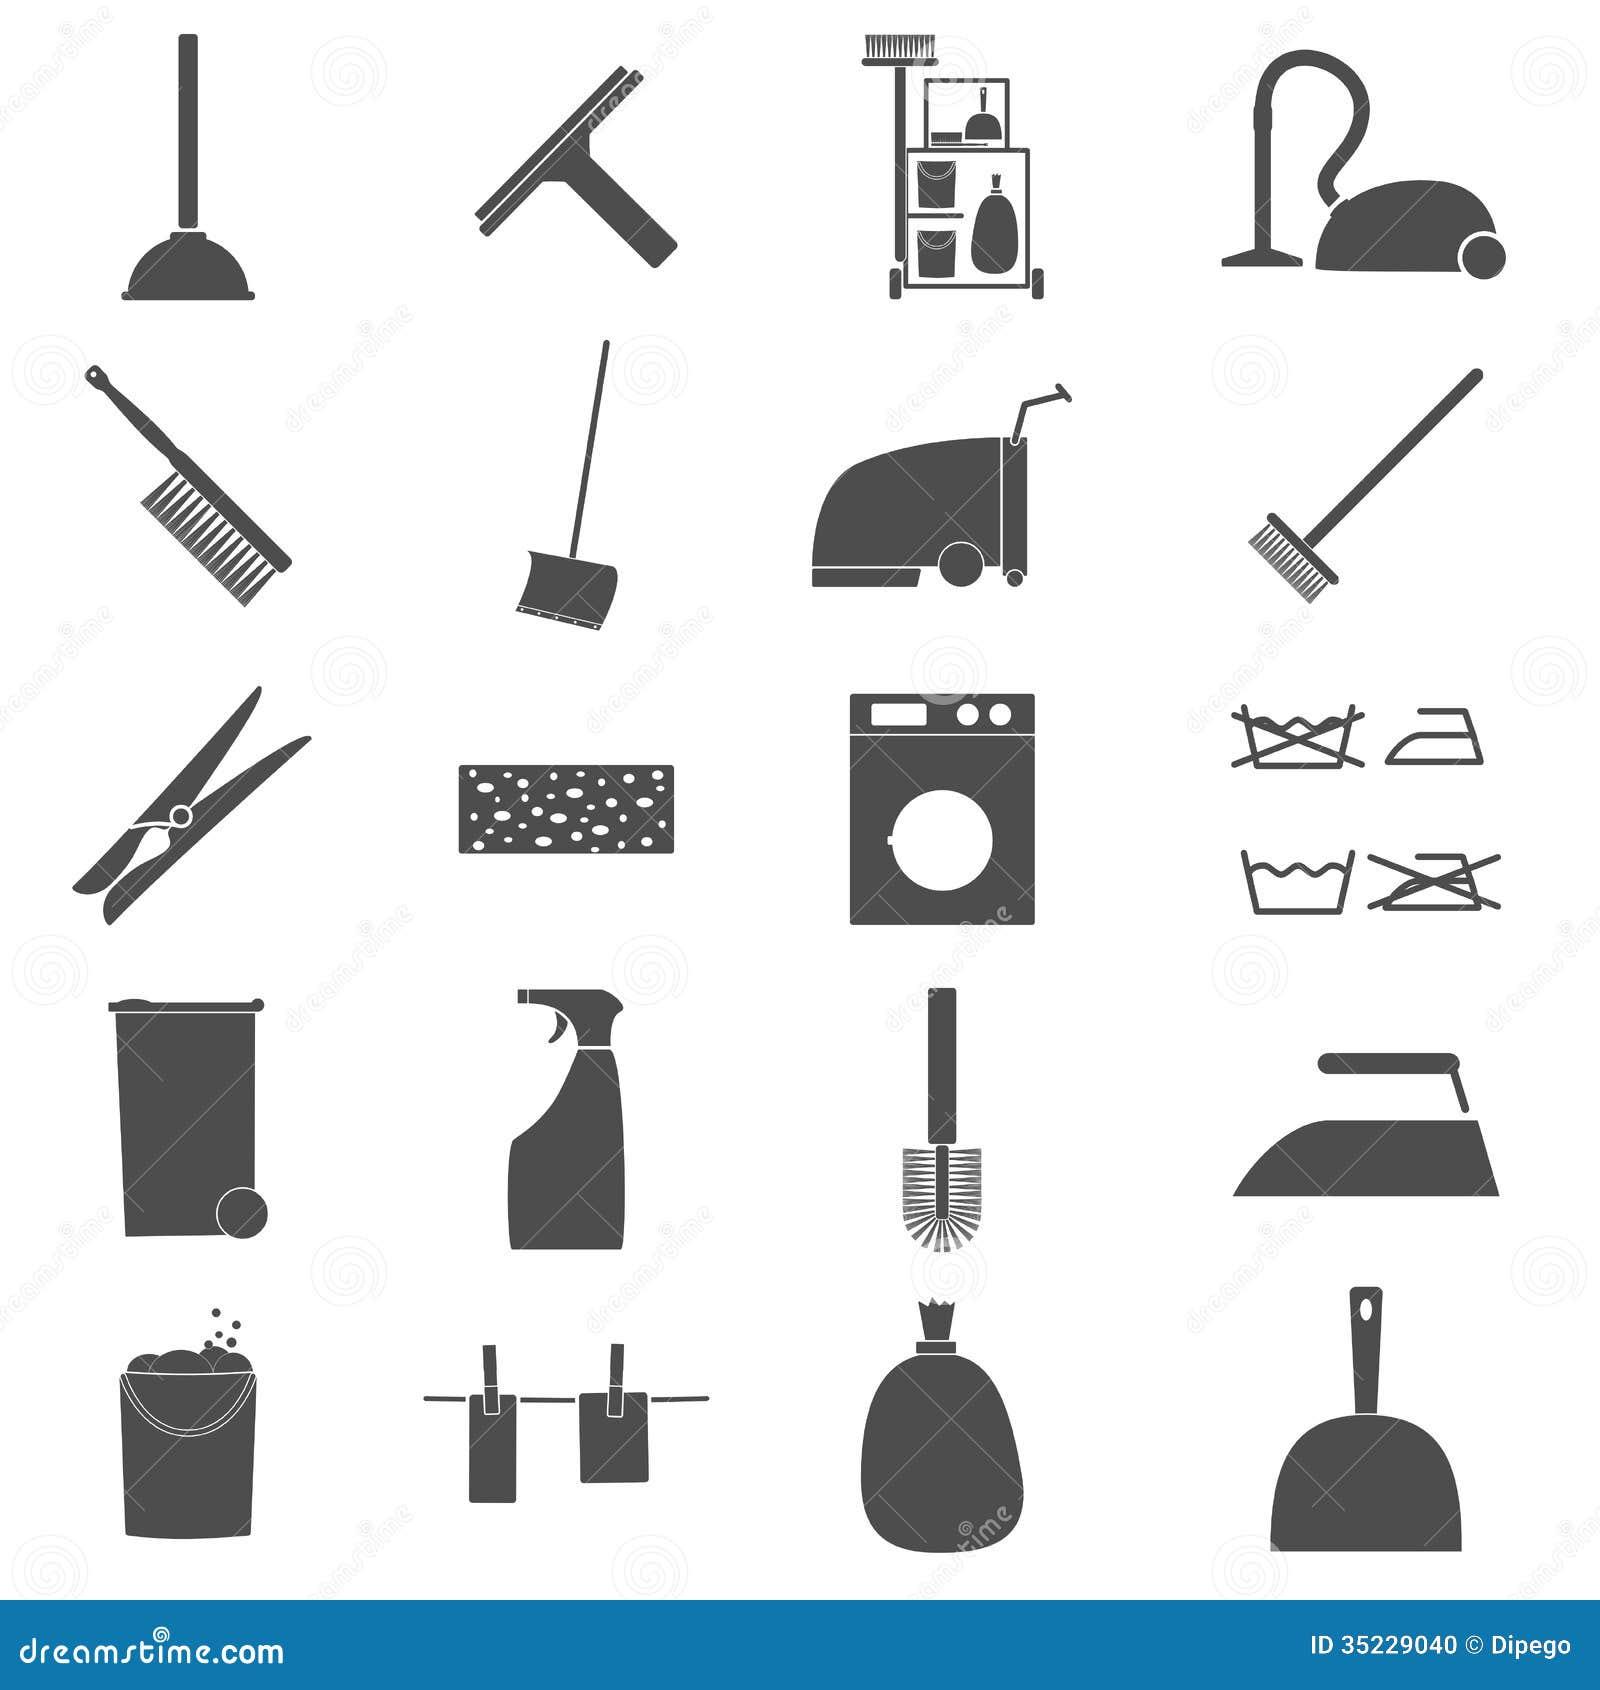 icon set cleaning stock illustration illustration of tool 35229040